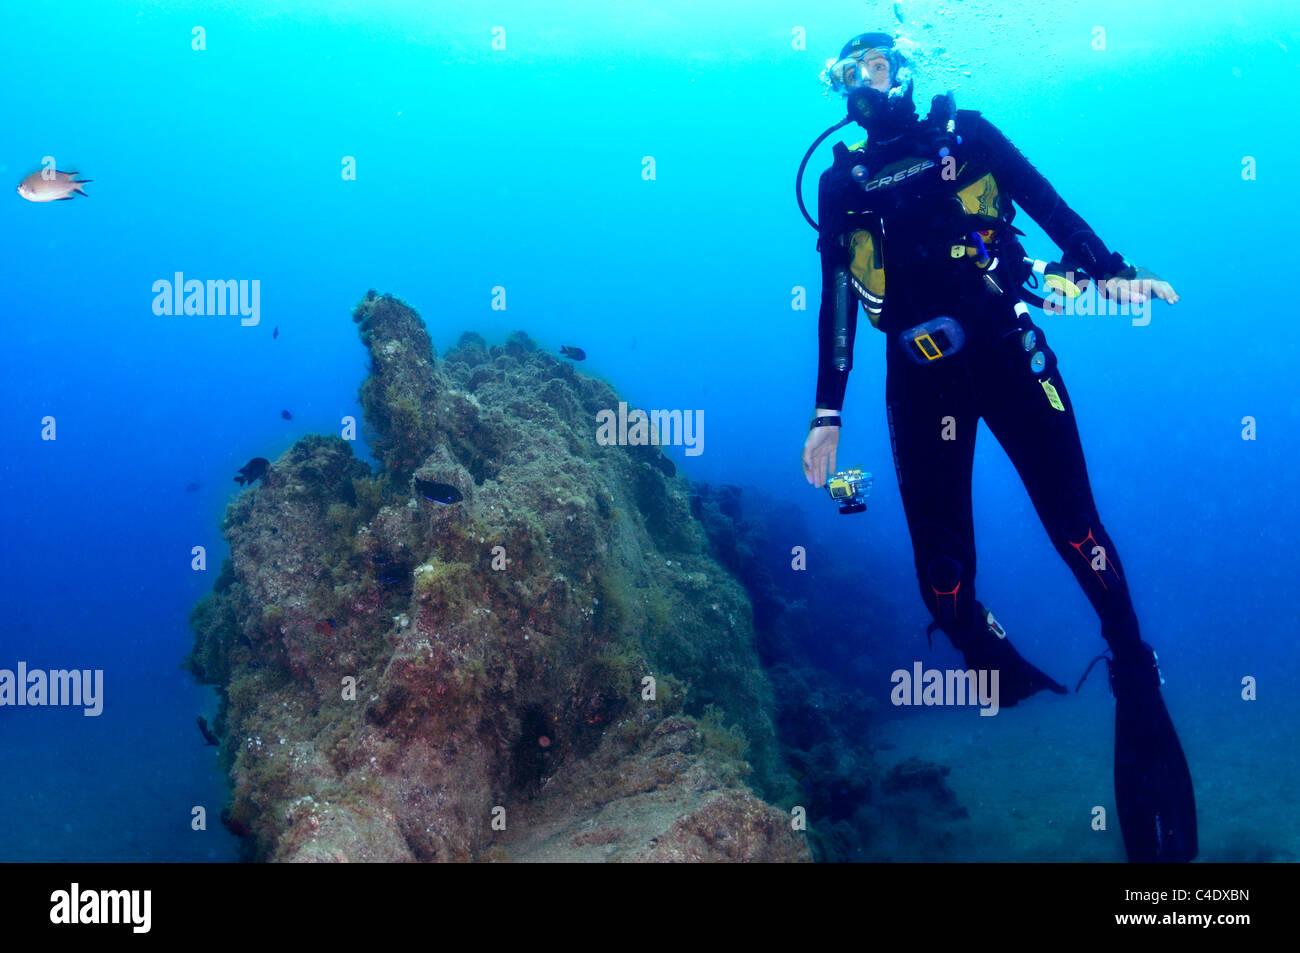 Scuba diver Photo Stock